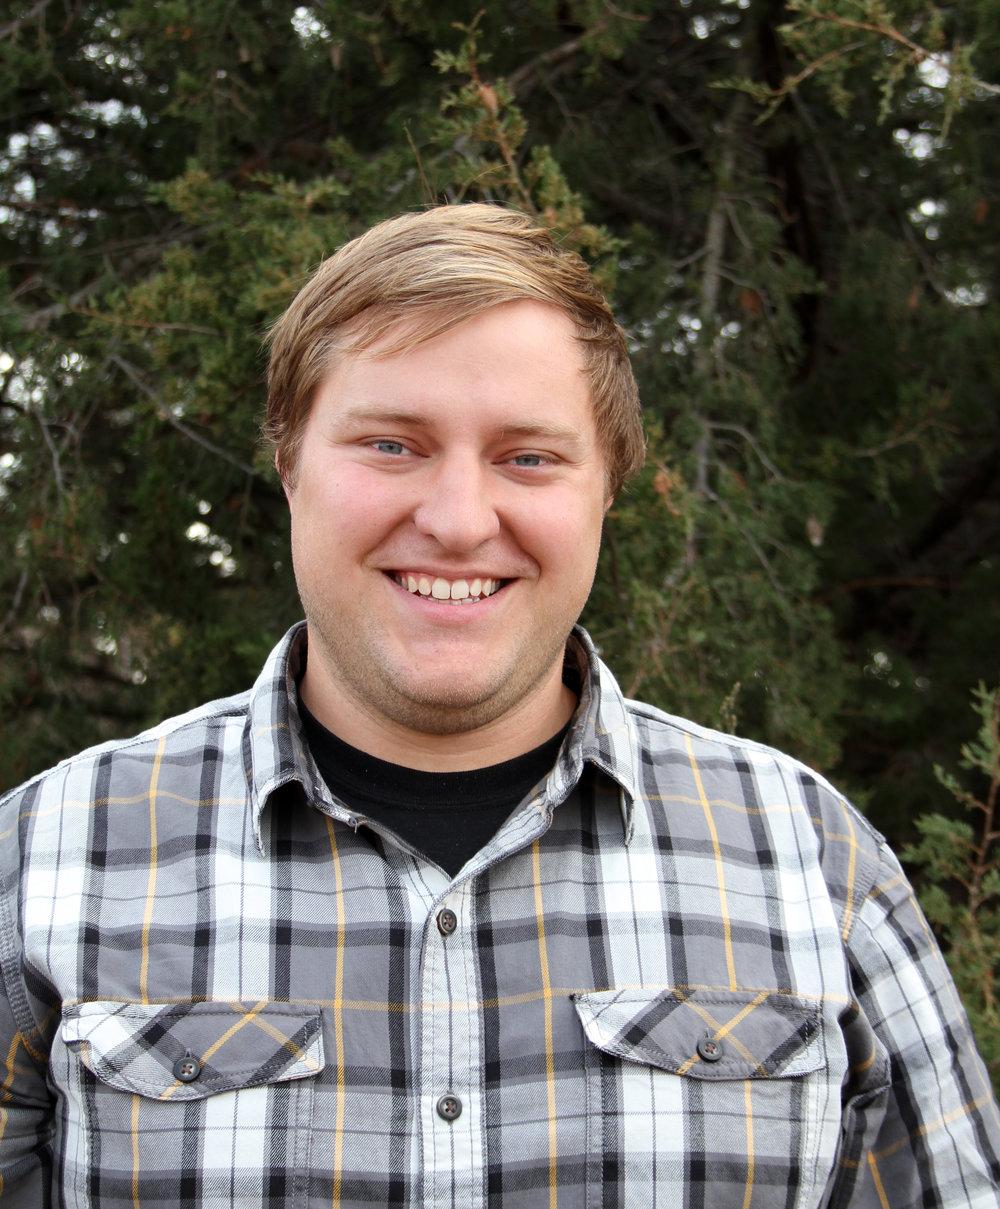 Youth/Young Adults Pastor - Corey Schneckloth cschneckloth@alccgi.com